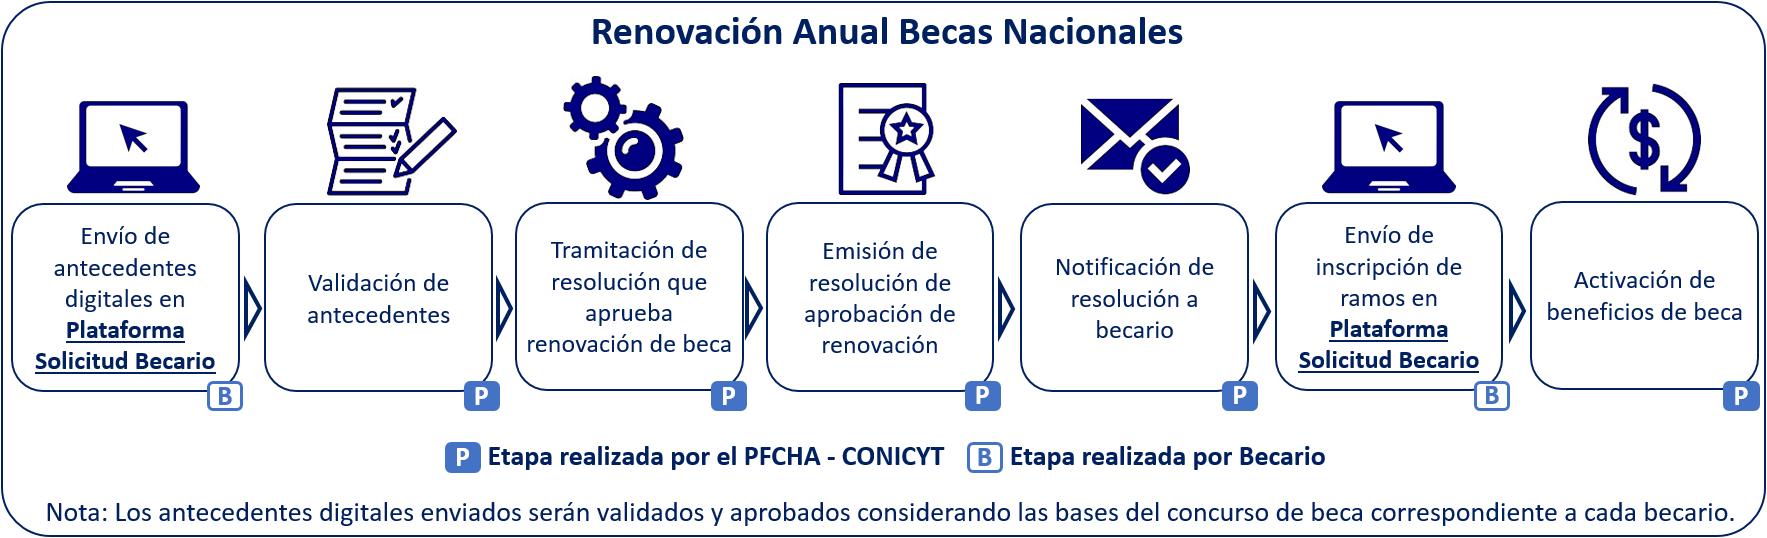 vf_renovacionnacional